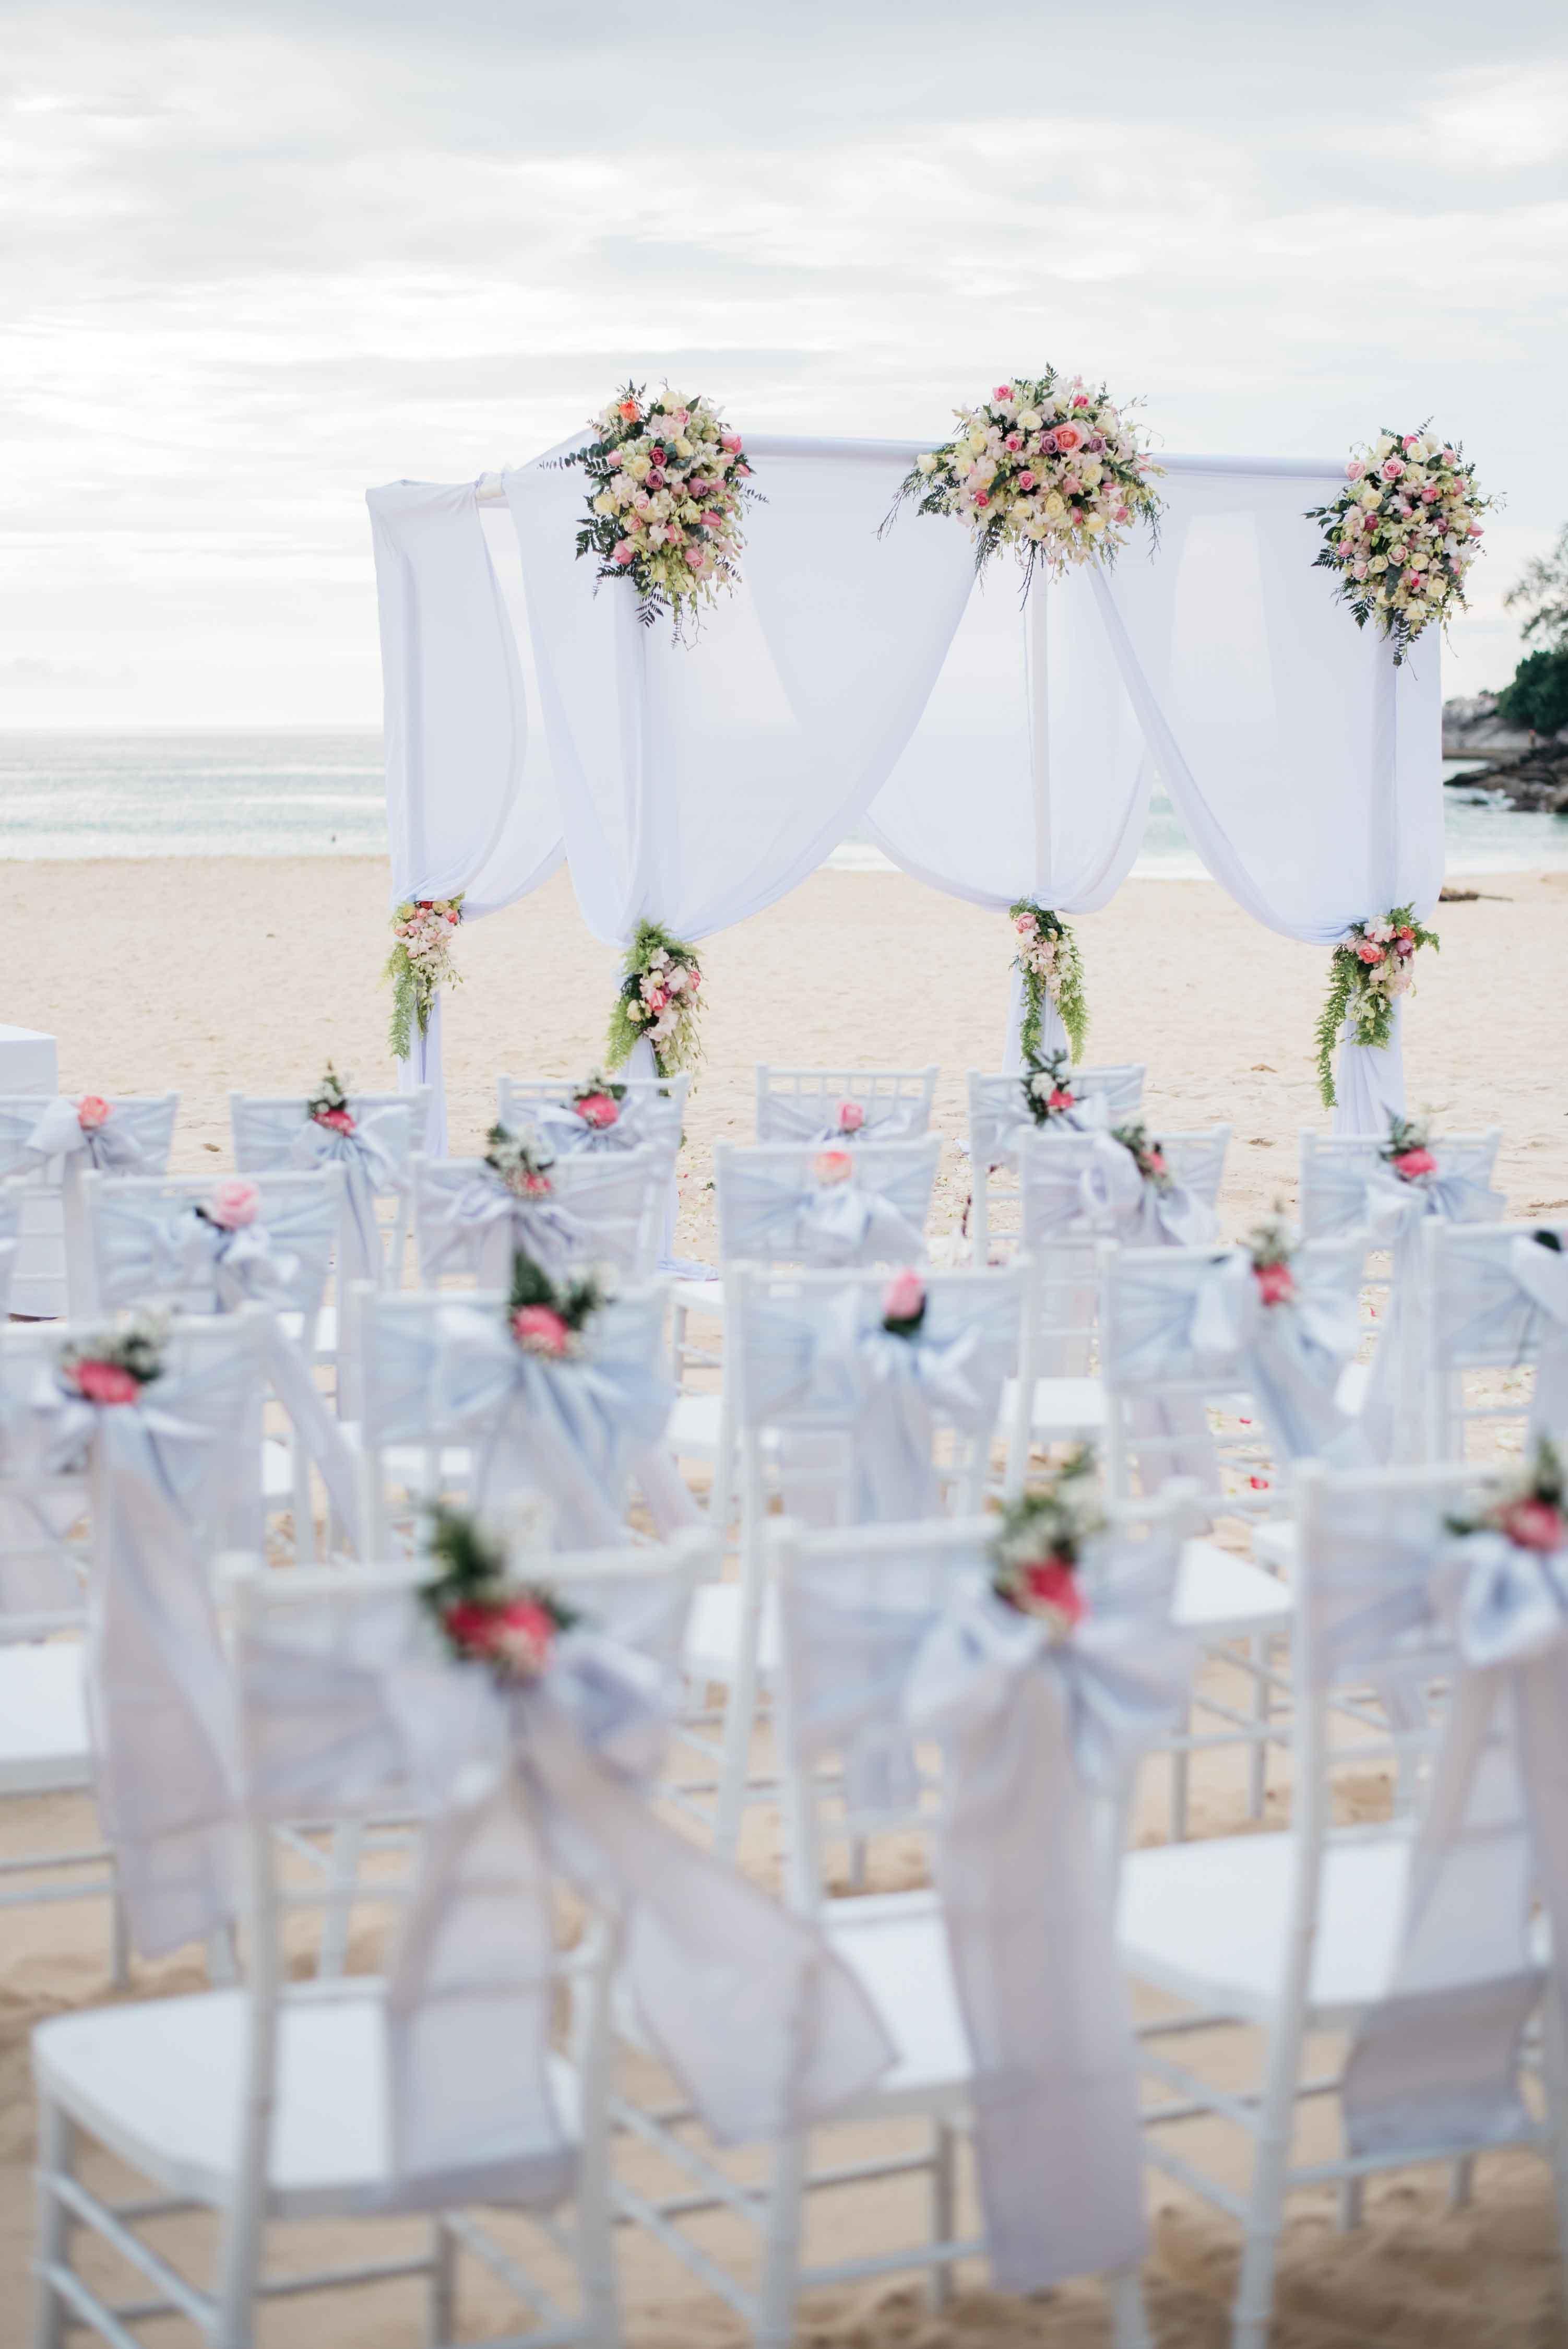 Centara-Grand-Beach-Resort-Kahlia-Luke-Wedding-13